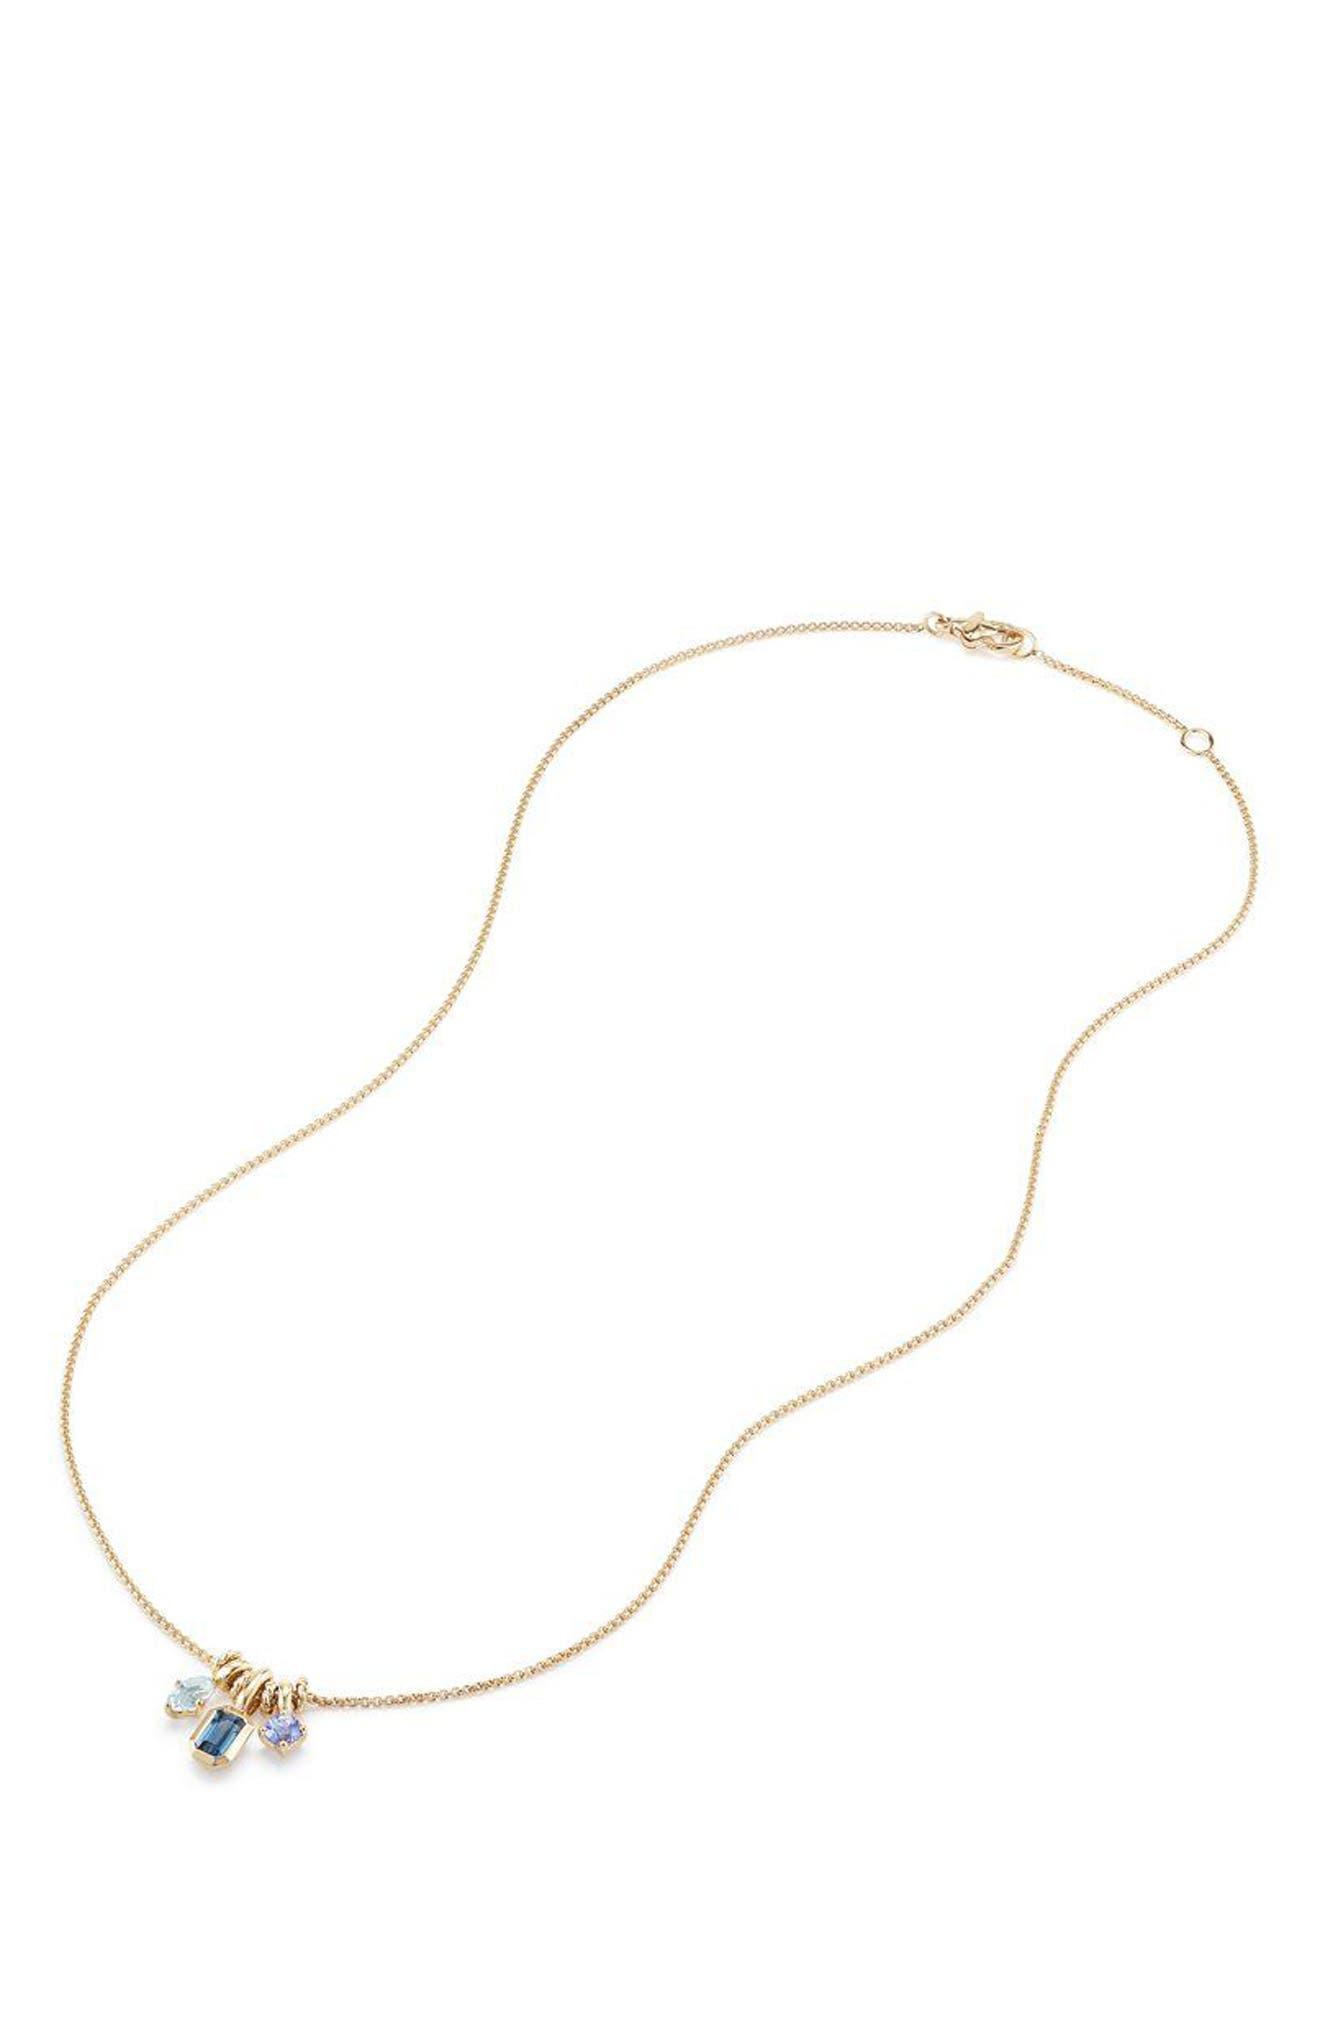 Novella Pendant Necklace in 18K Gold,                             Alternate thumbnail 2, color,                             GOLD/ BLUE TOPAZ/ AQUAMARINE